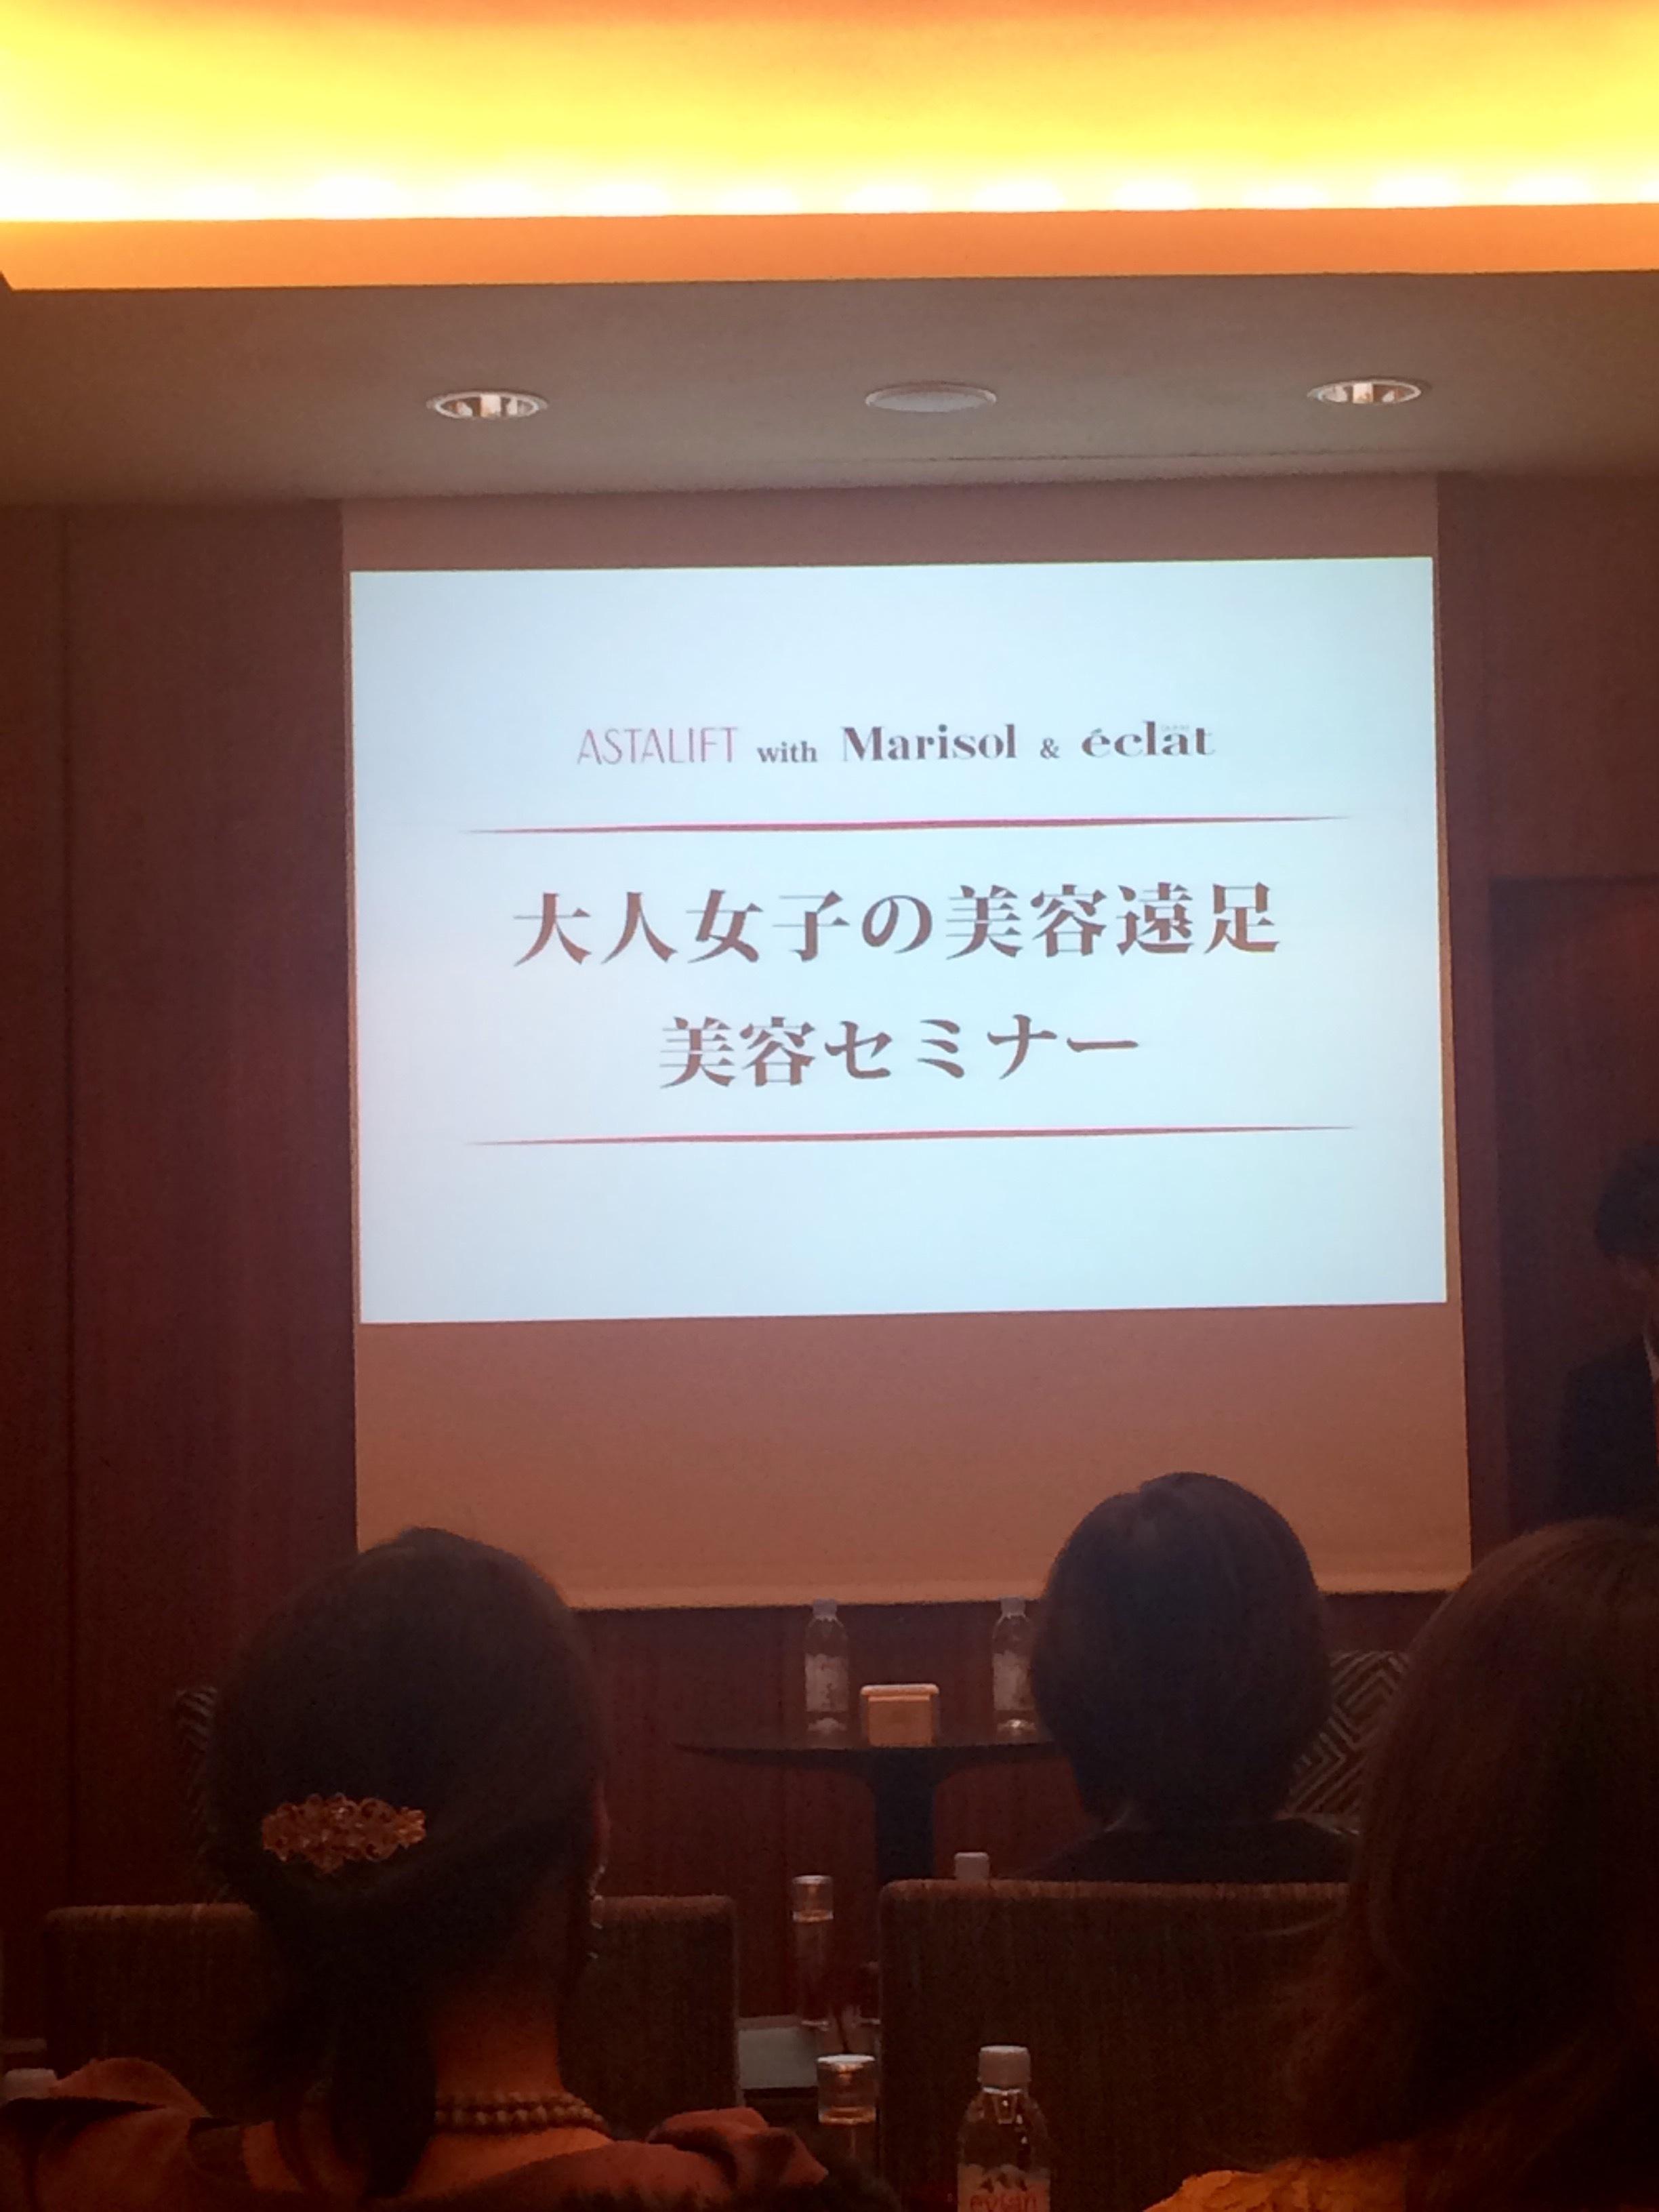 ASTALIFT with Marisol & eclat「大人女子の美容遠足」_1_4-1